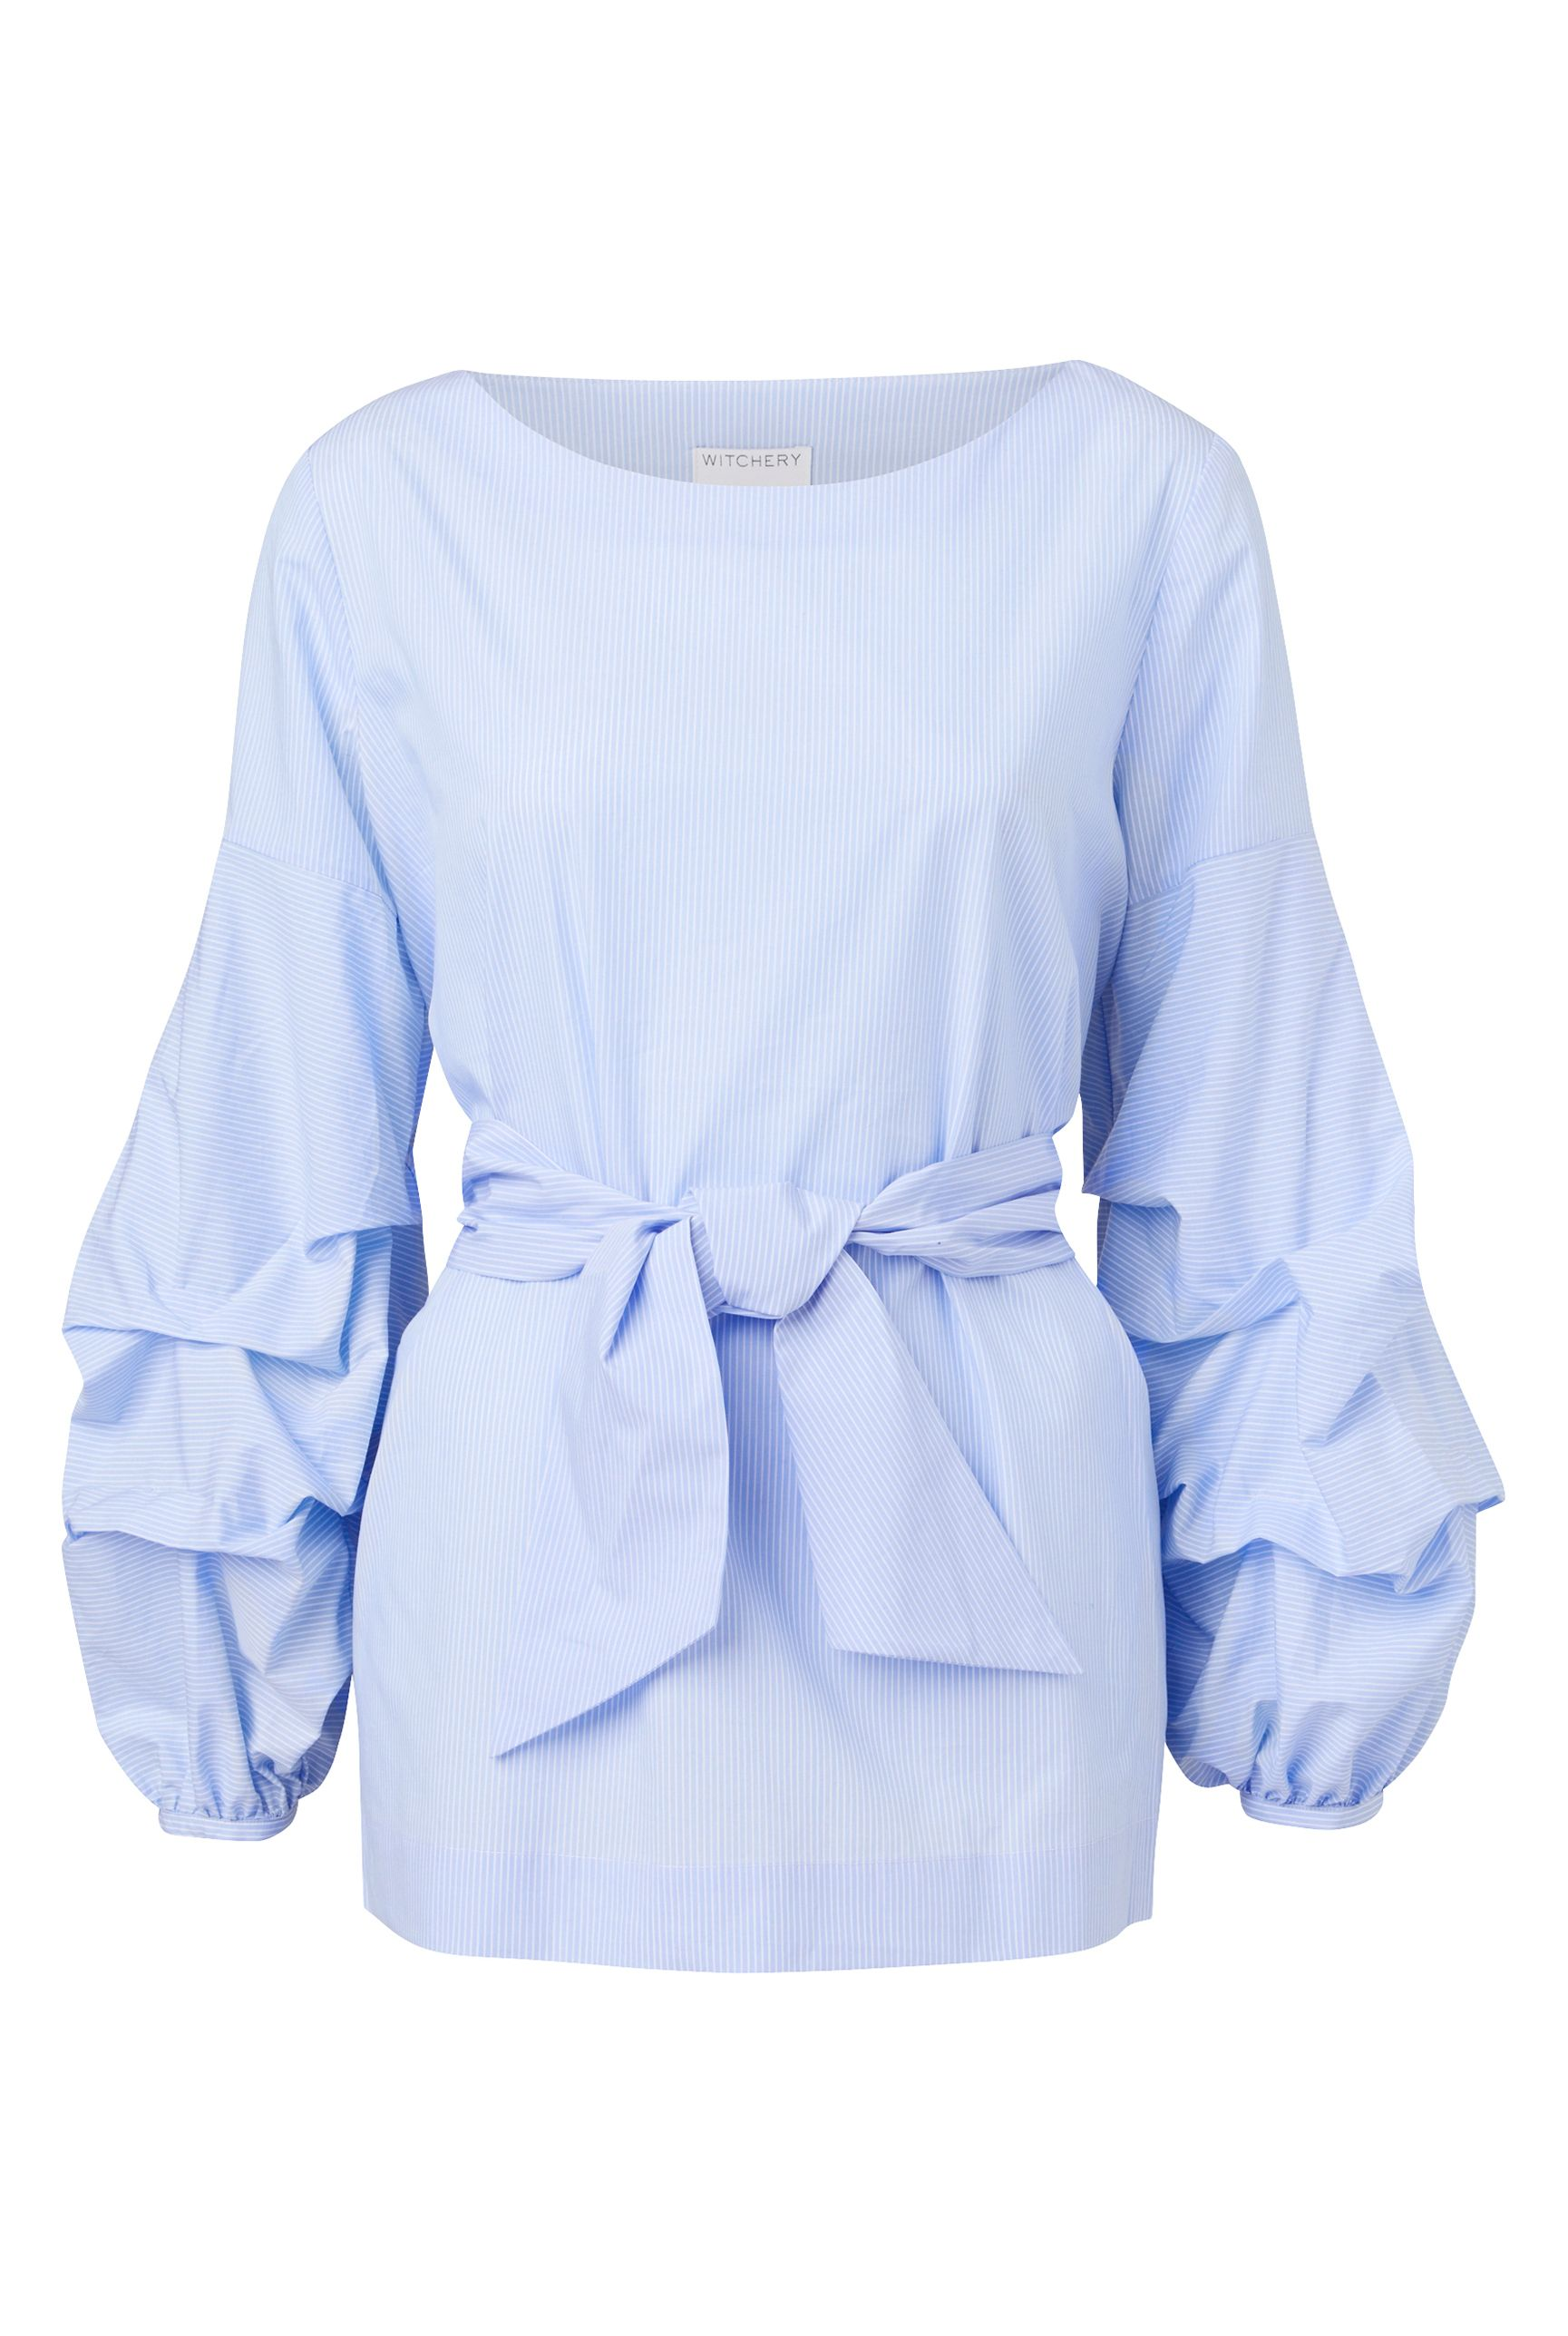 60212375_Witchery Modern Wrap Shirt, RRP $139.90